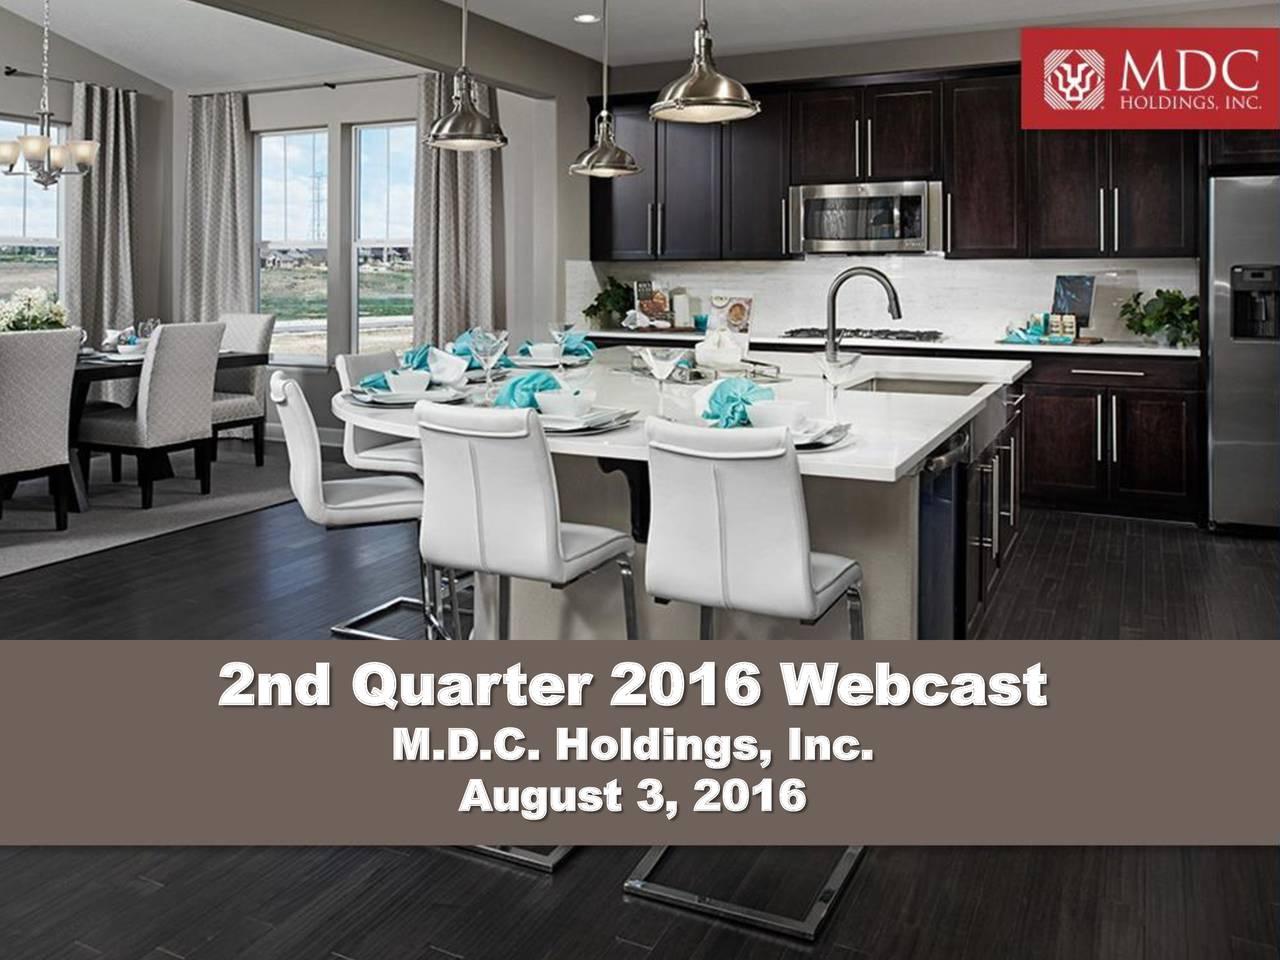 M.D.C. Holdings, Inc. August 3, 2016